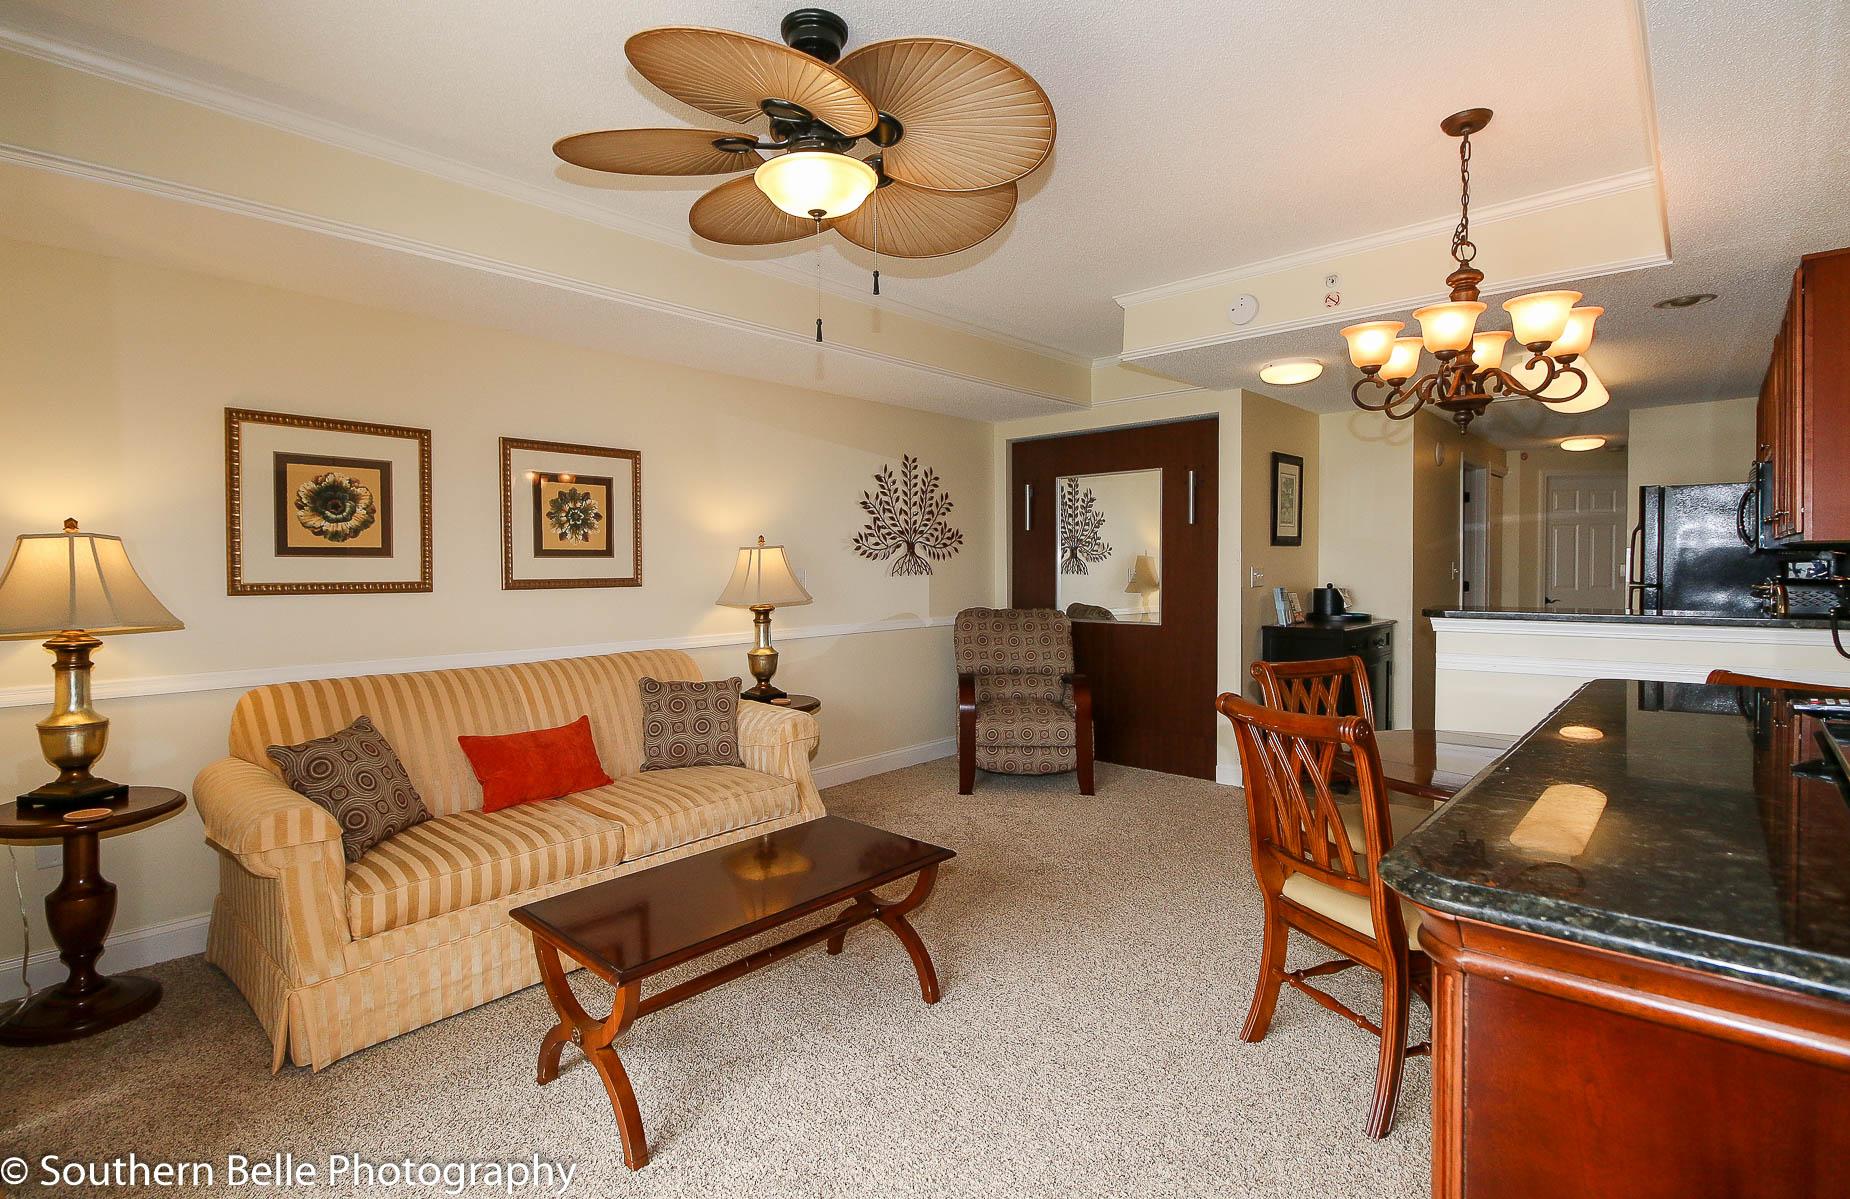 15. Living Room & Kitchen View WM